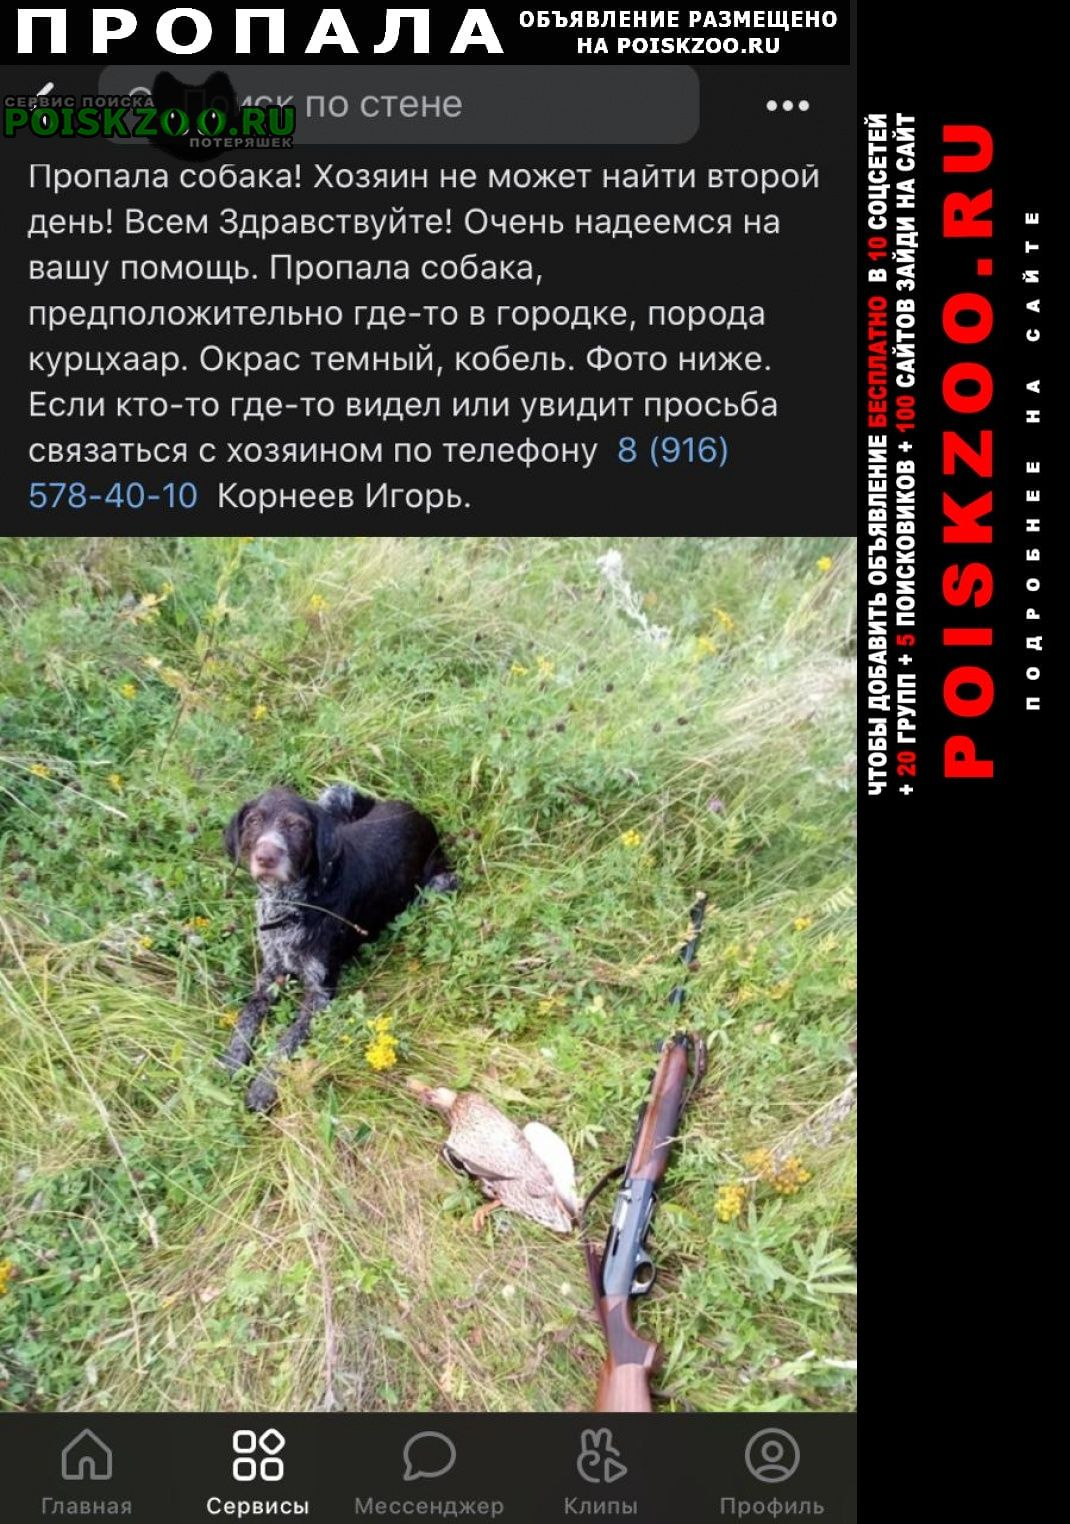 Сергиев Посад Пропала собака кобель